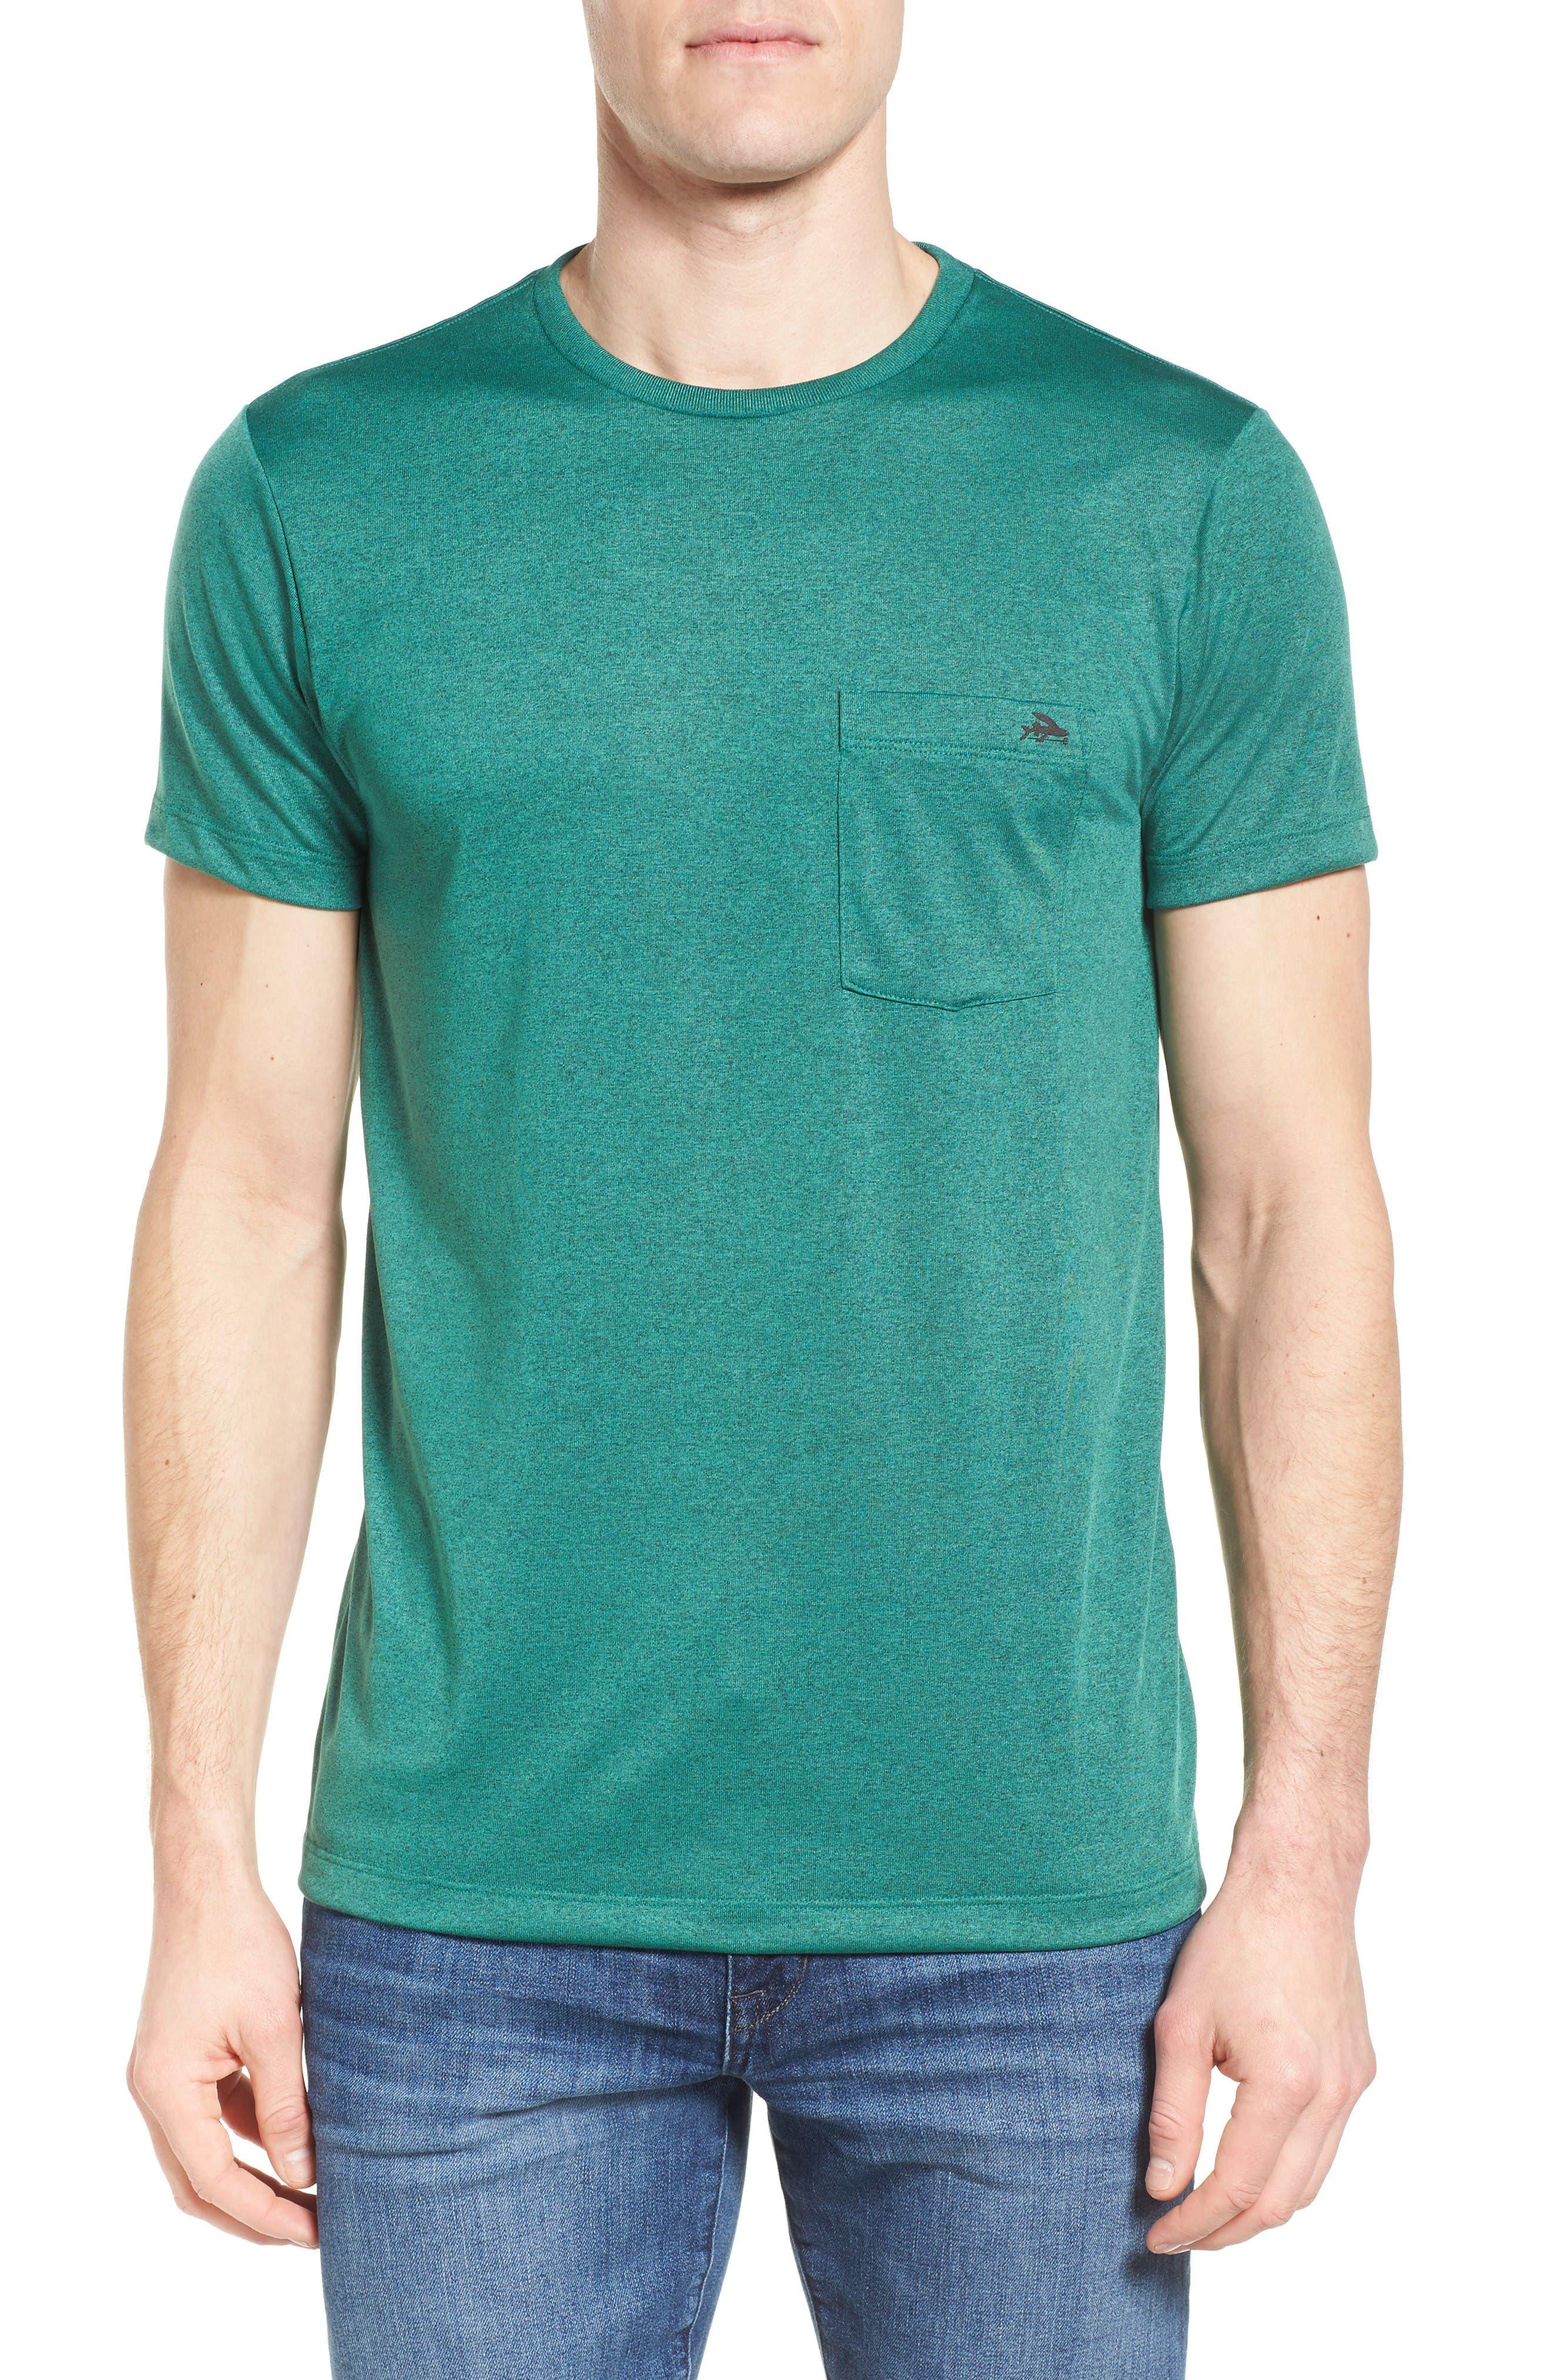 PATAGONIA Flying Fish Responsibili-Tee<sup>®</sup> Slim Fit T-Shirt